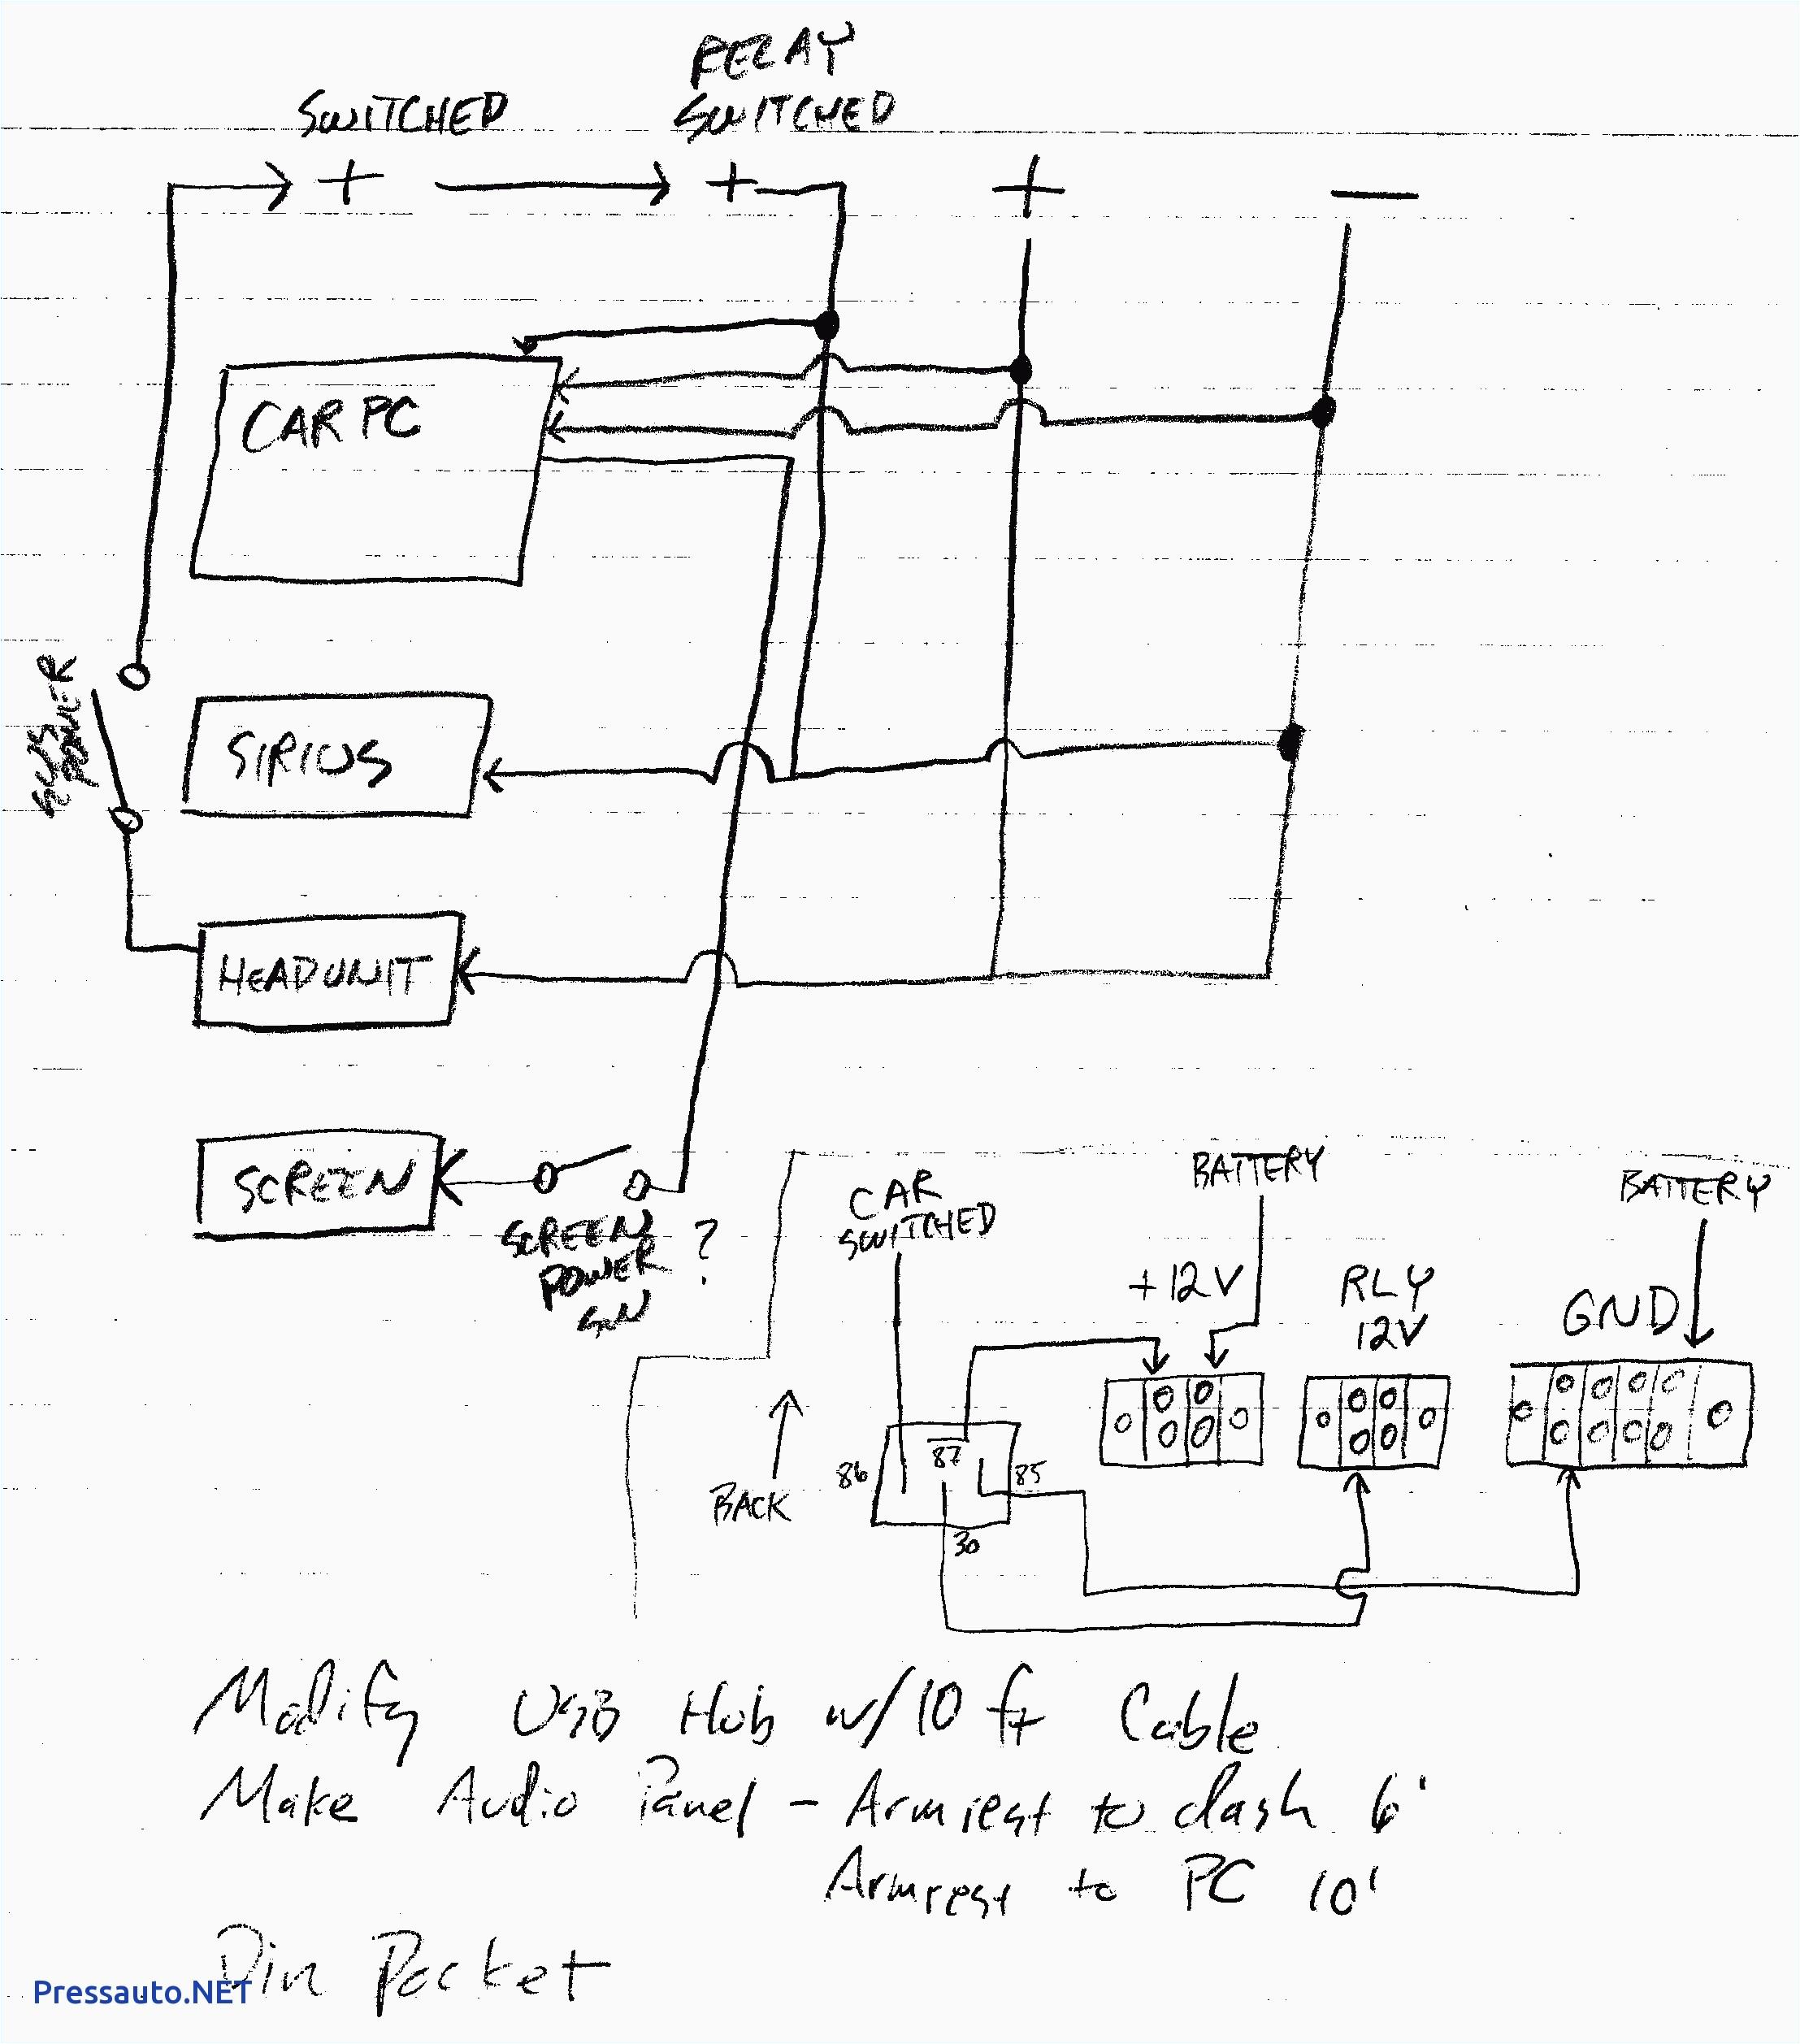 wiring diagram e60 wiring diagram name wiring diagram e60 can wiring diagram e60 wiring diagrams wiring